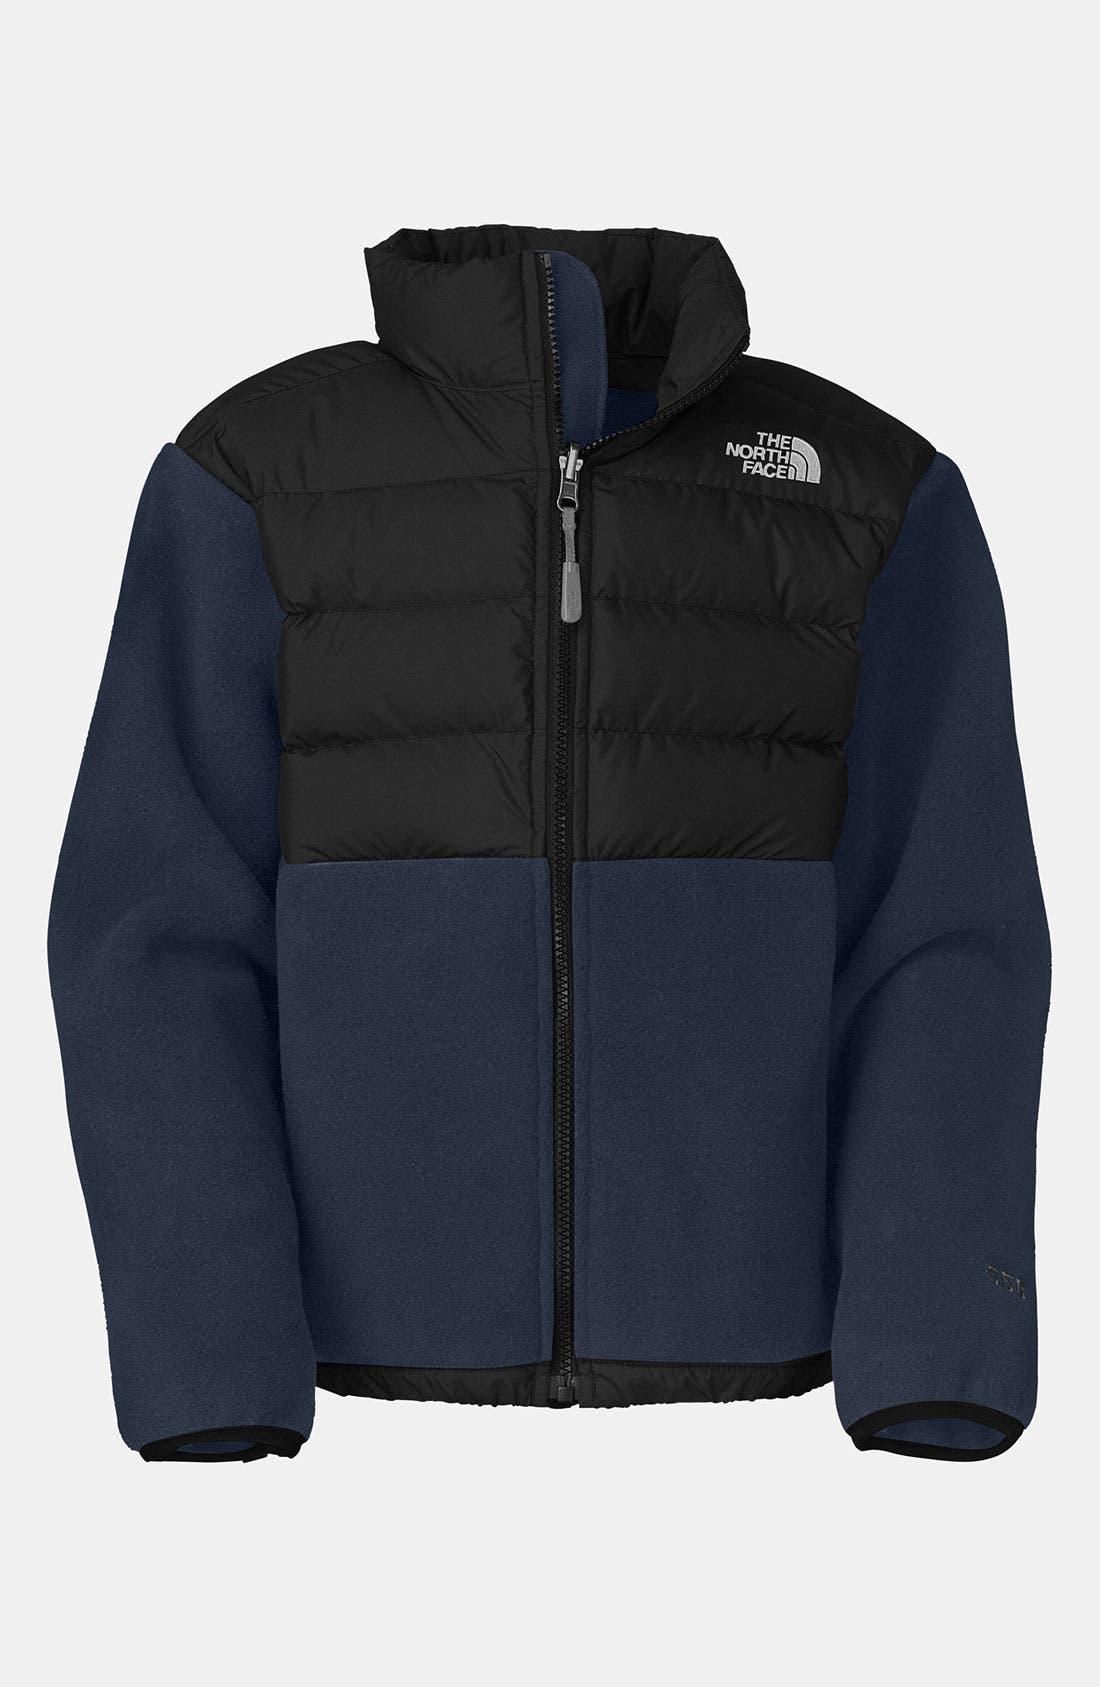 Alternate Image 1 Selected - The North Face 'Denali' Down Jacket (Big Boys)